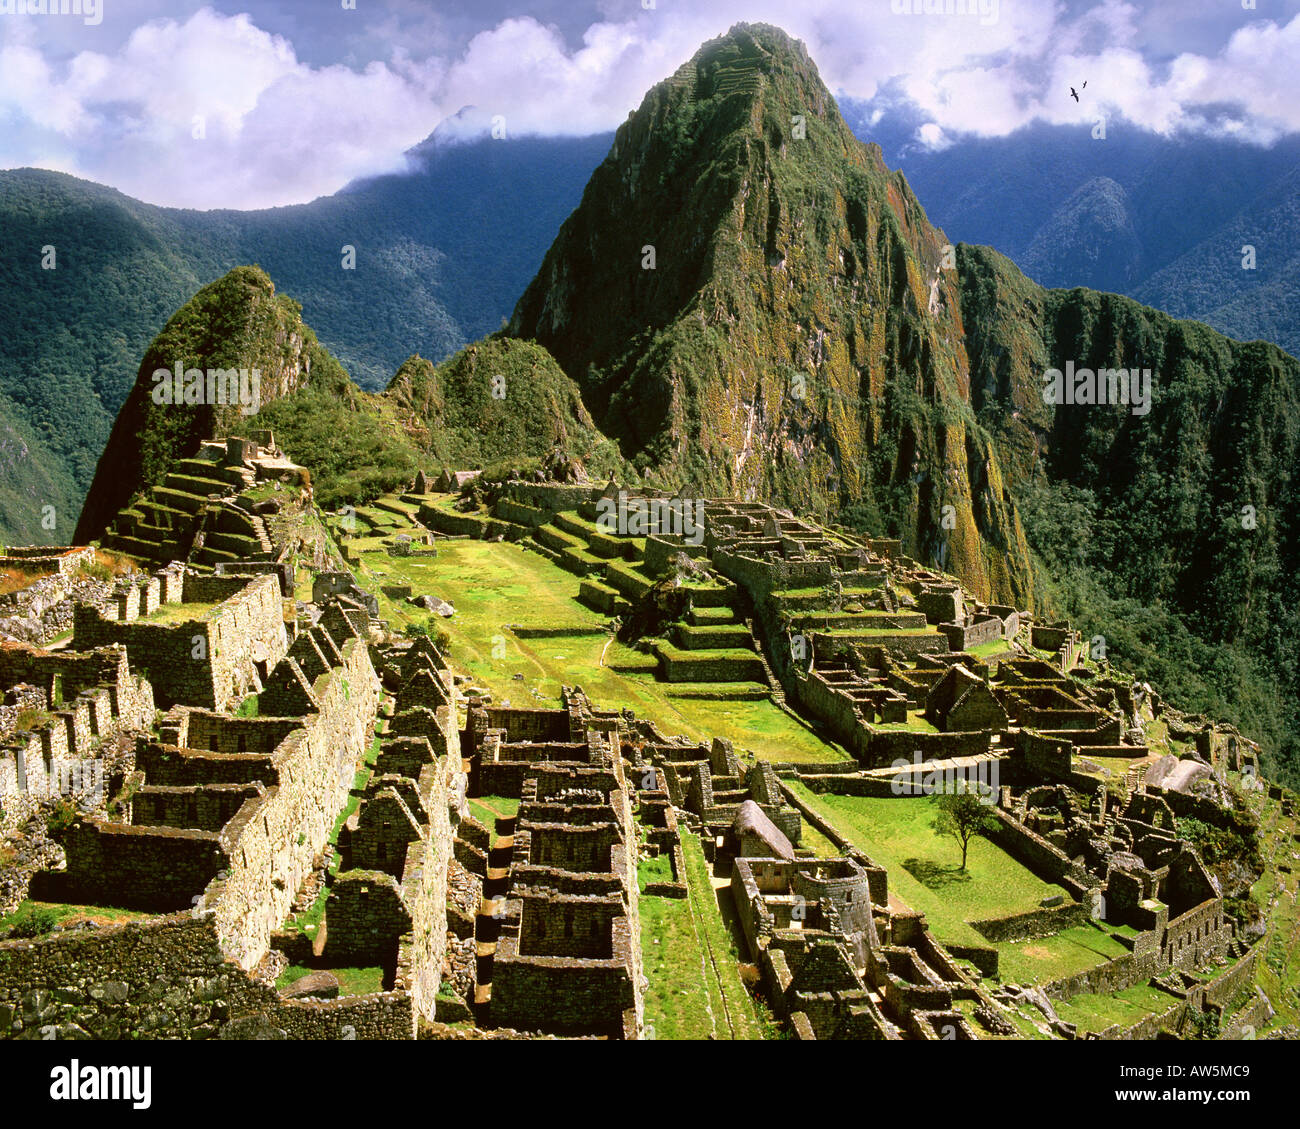 PE - Cuzco: Machu Picchu, l'antica città Inca delle Ande Foto Stock